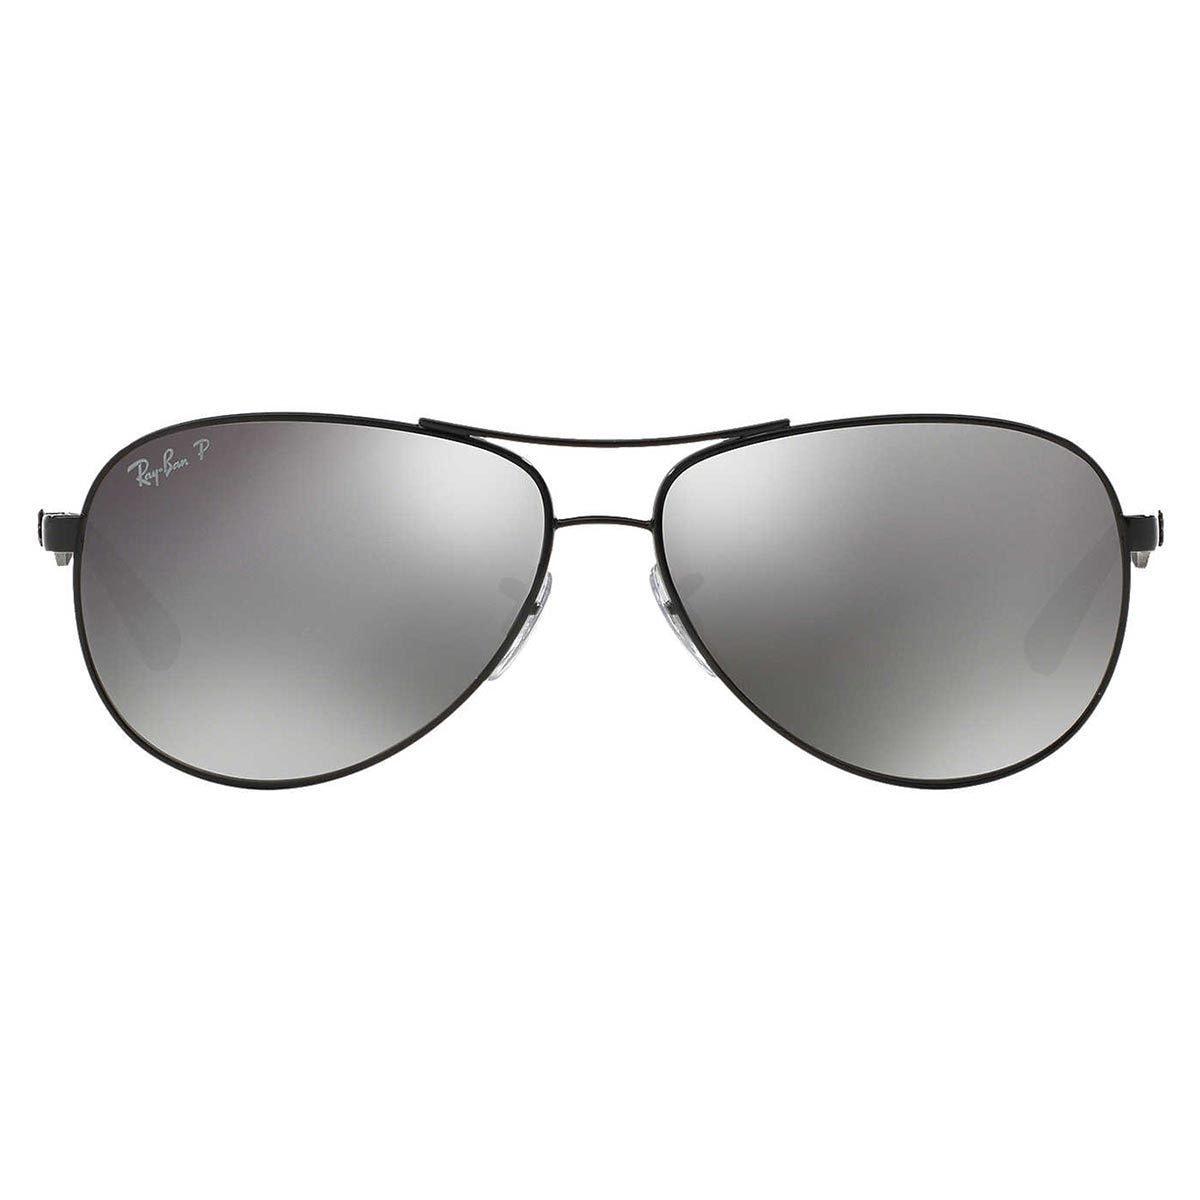 5d983f545d Shop Ray-Ban Unisex Tech RB 8313 002 K7 Shiny Black Carbon Fiber Aviator  Sunglasses - Free Shipping Today - Overstock - 10430807